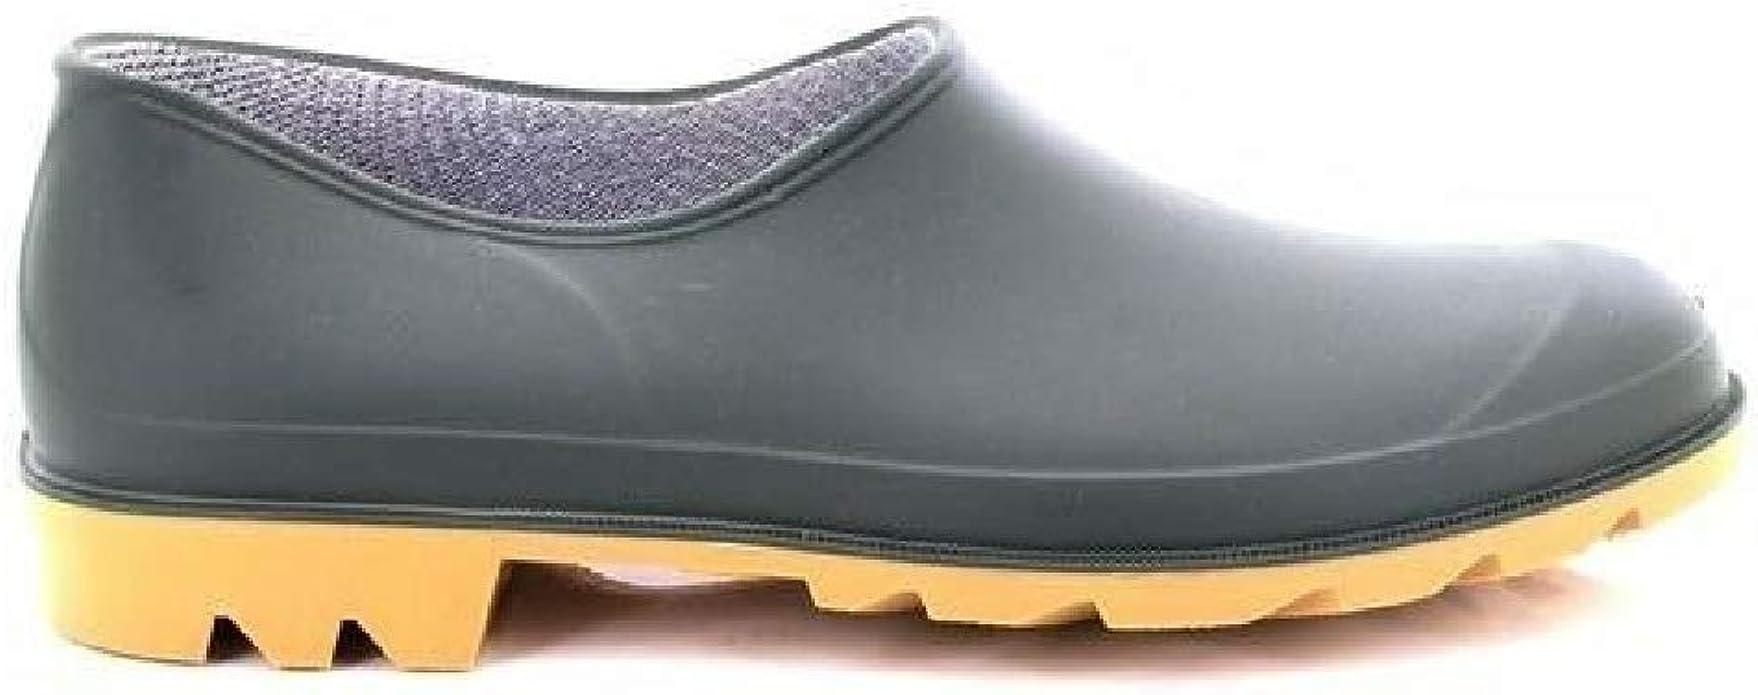 StormWells GARDENER W271 Unisex Garden Clog//Welly Shoes Clogs